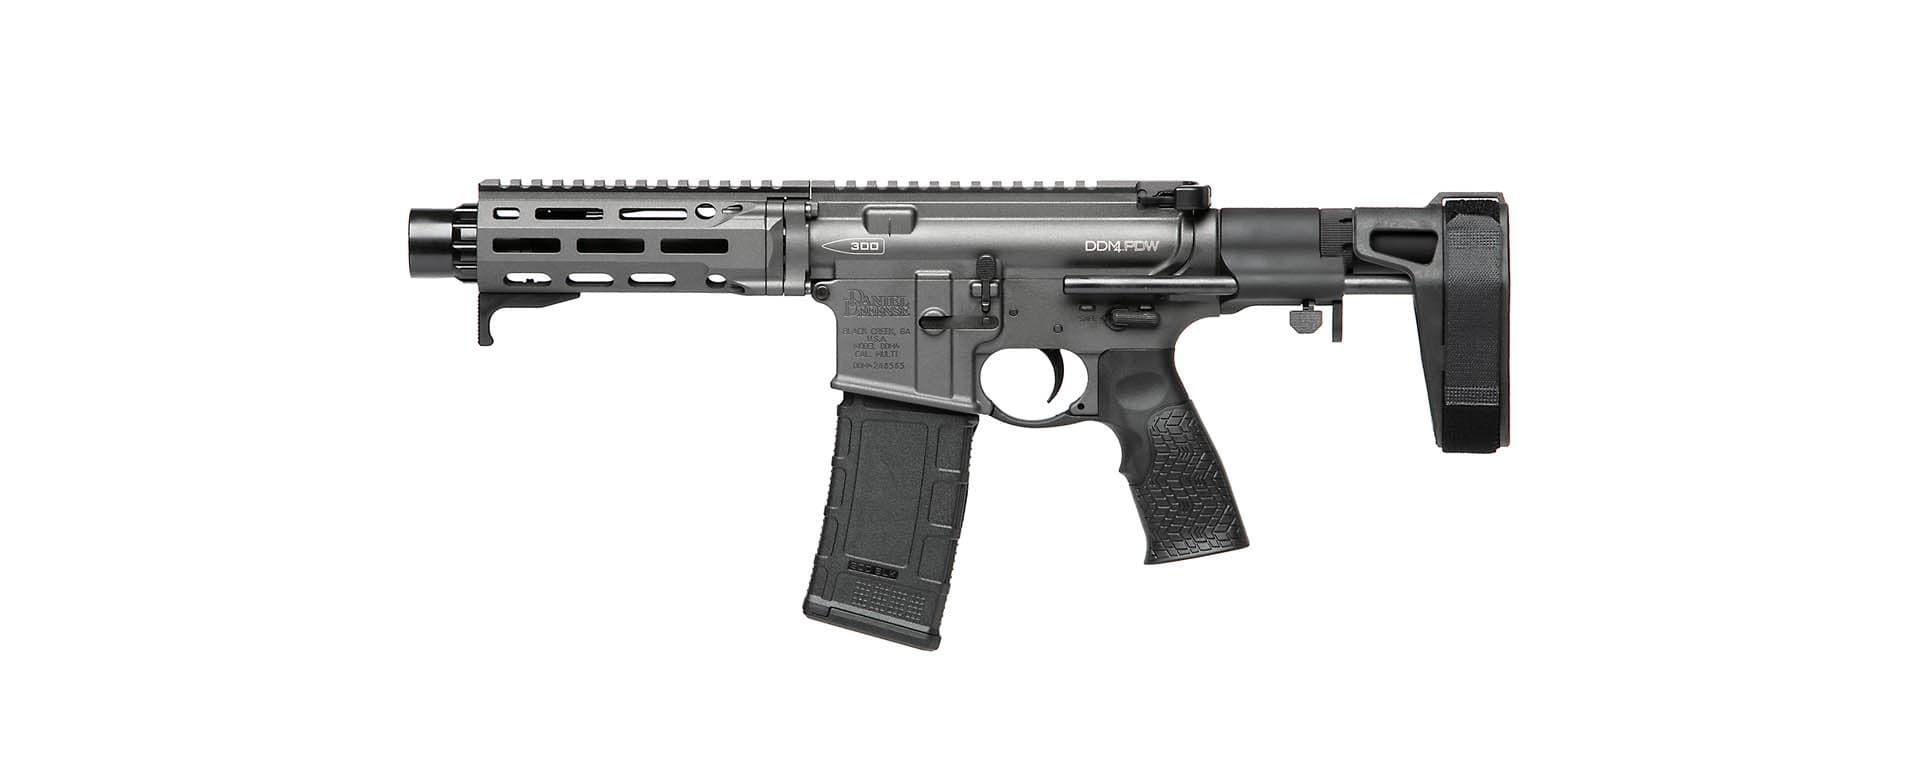 https://cityarsenal.com/product/daniel-defense-ddm4-pdw-300-blk-pistol-cobalt-02-088-03260-047/